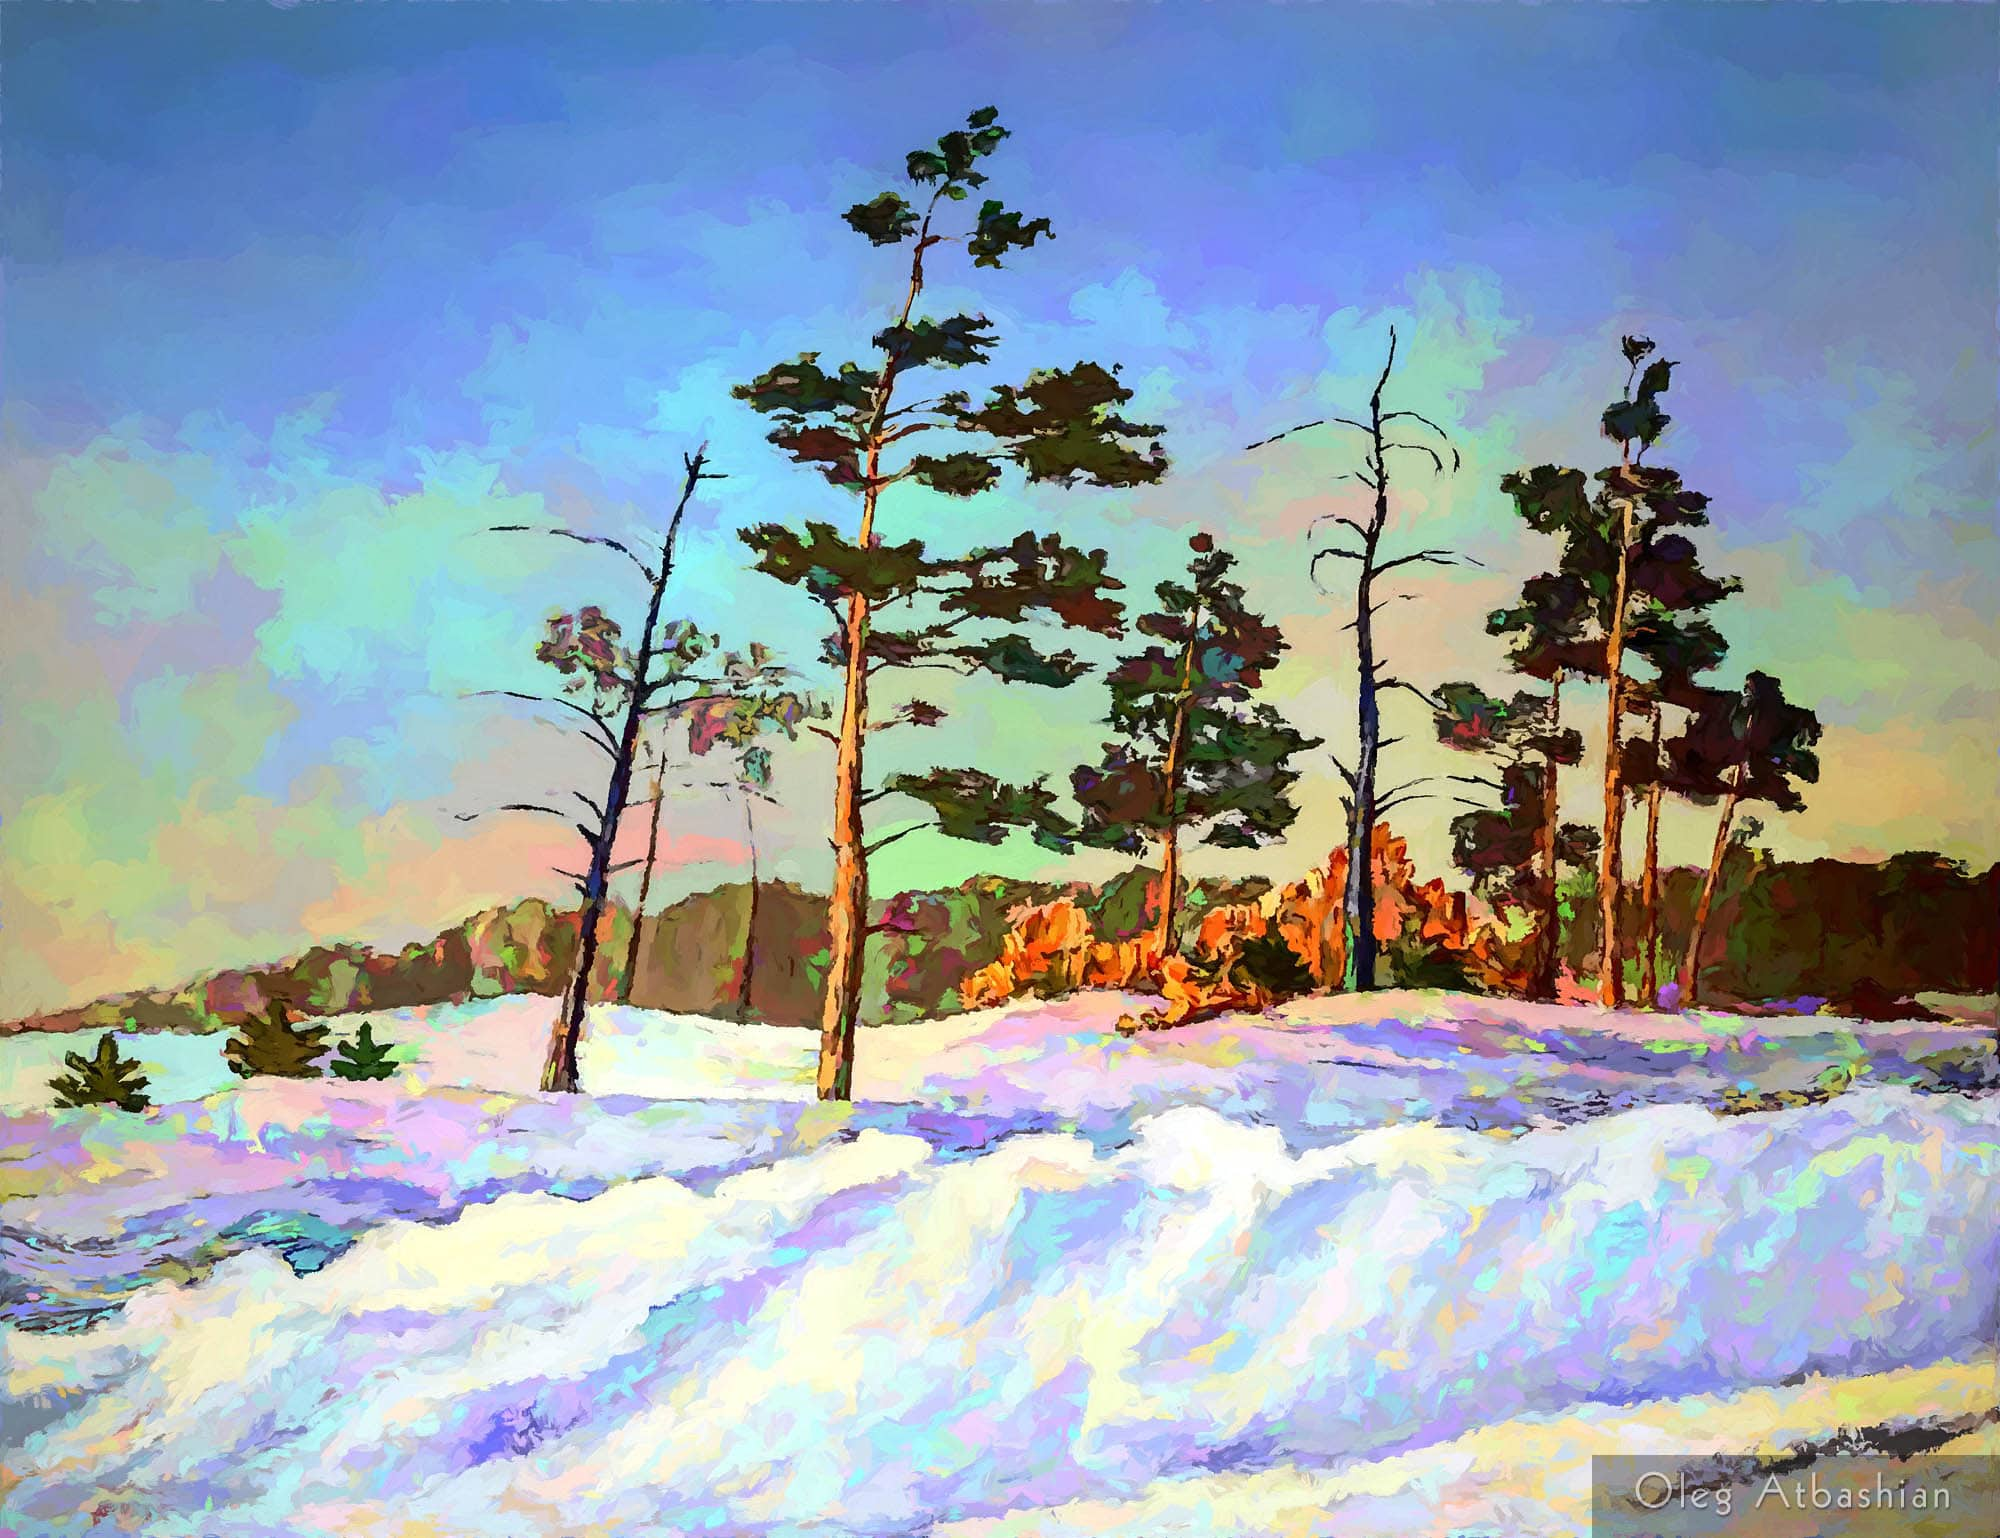 Snowy Road in Siberia